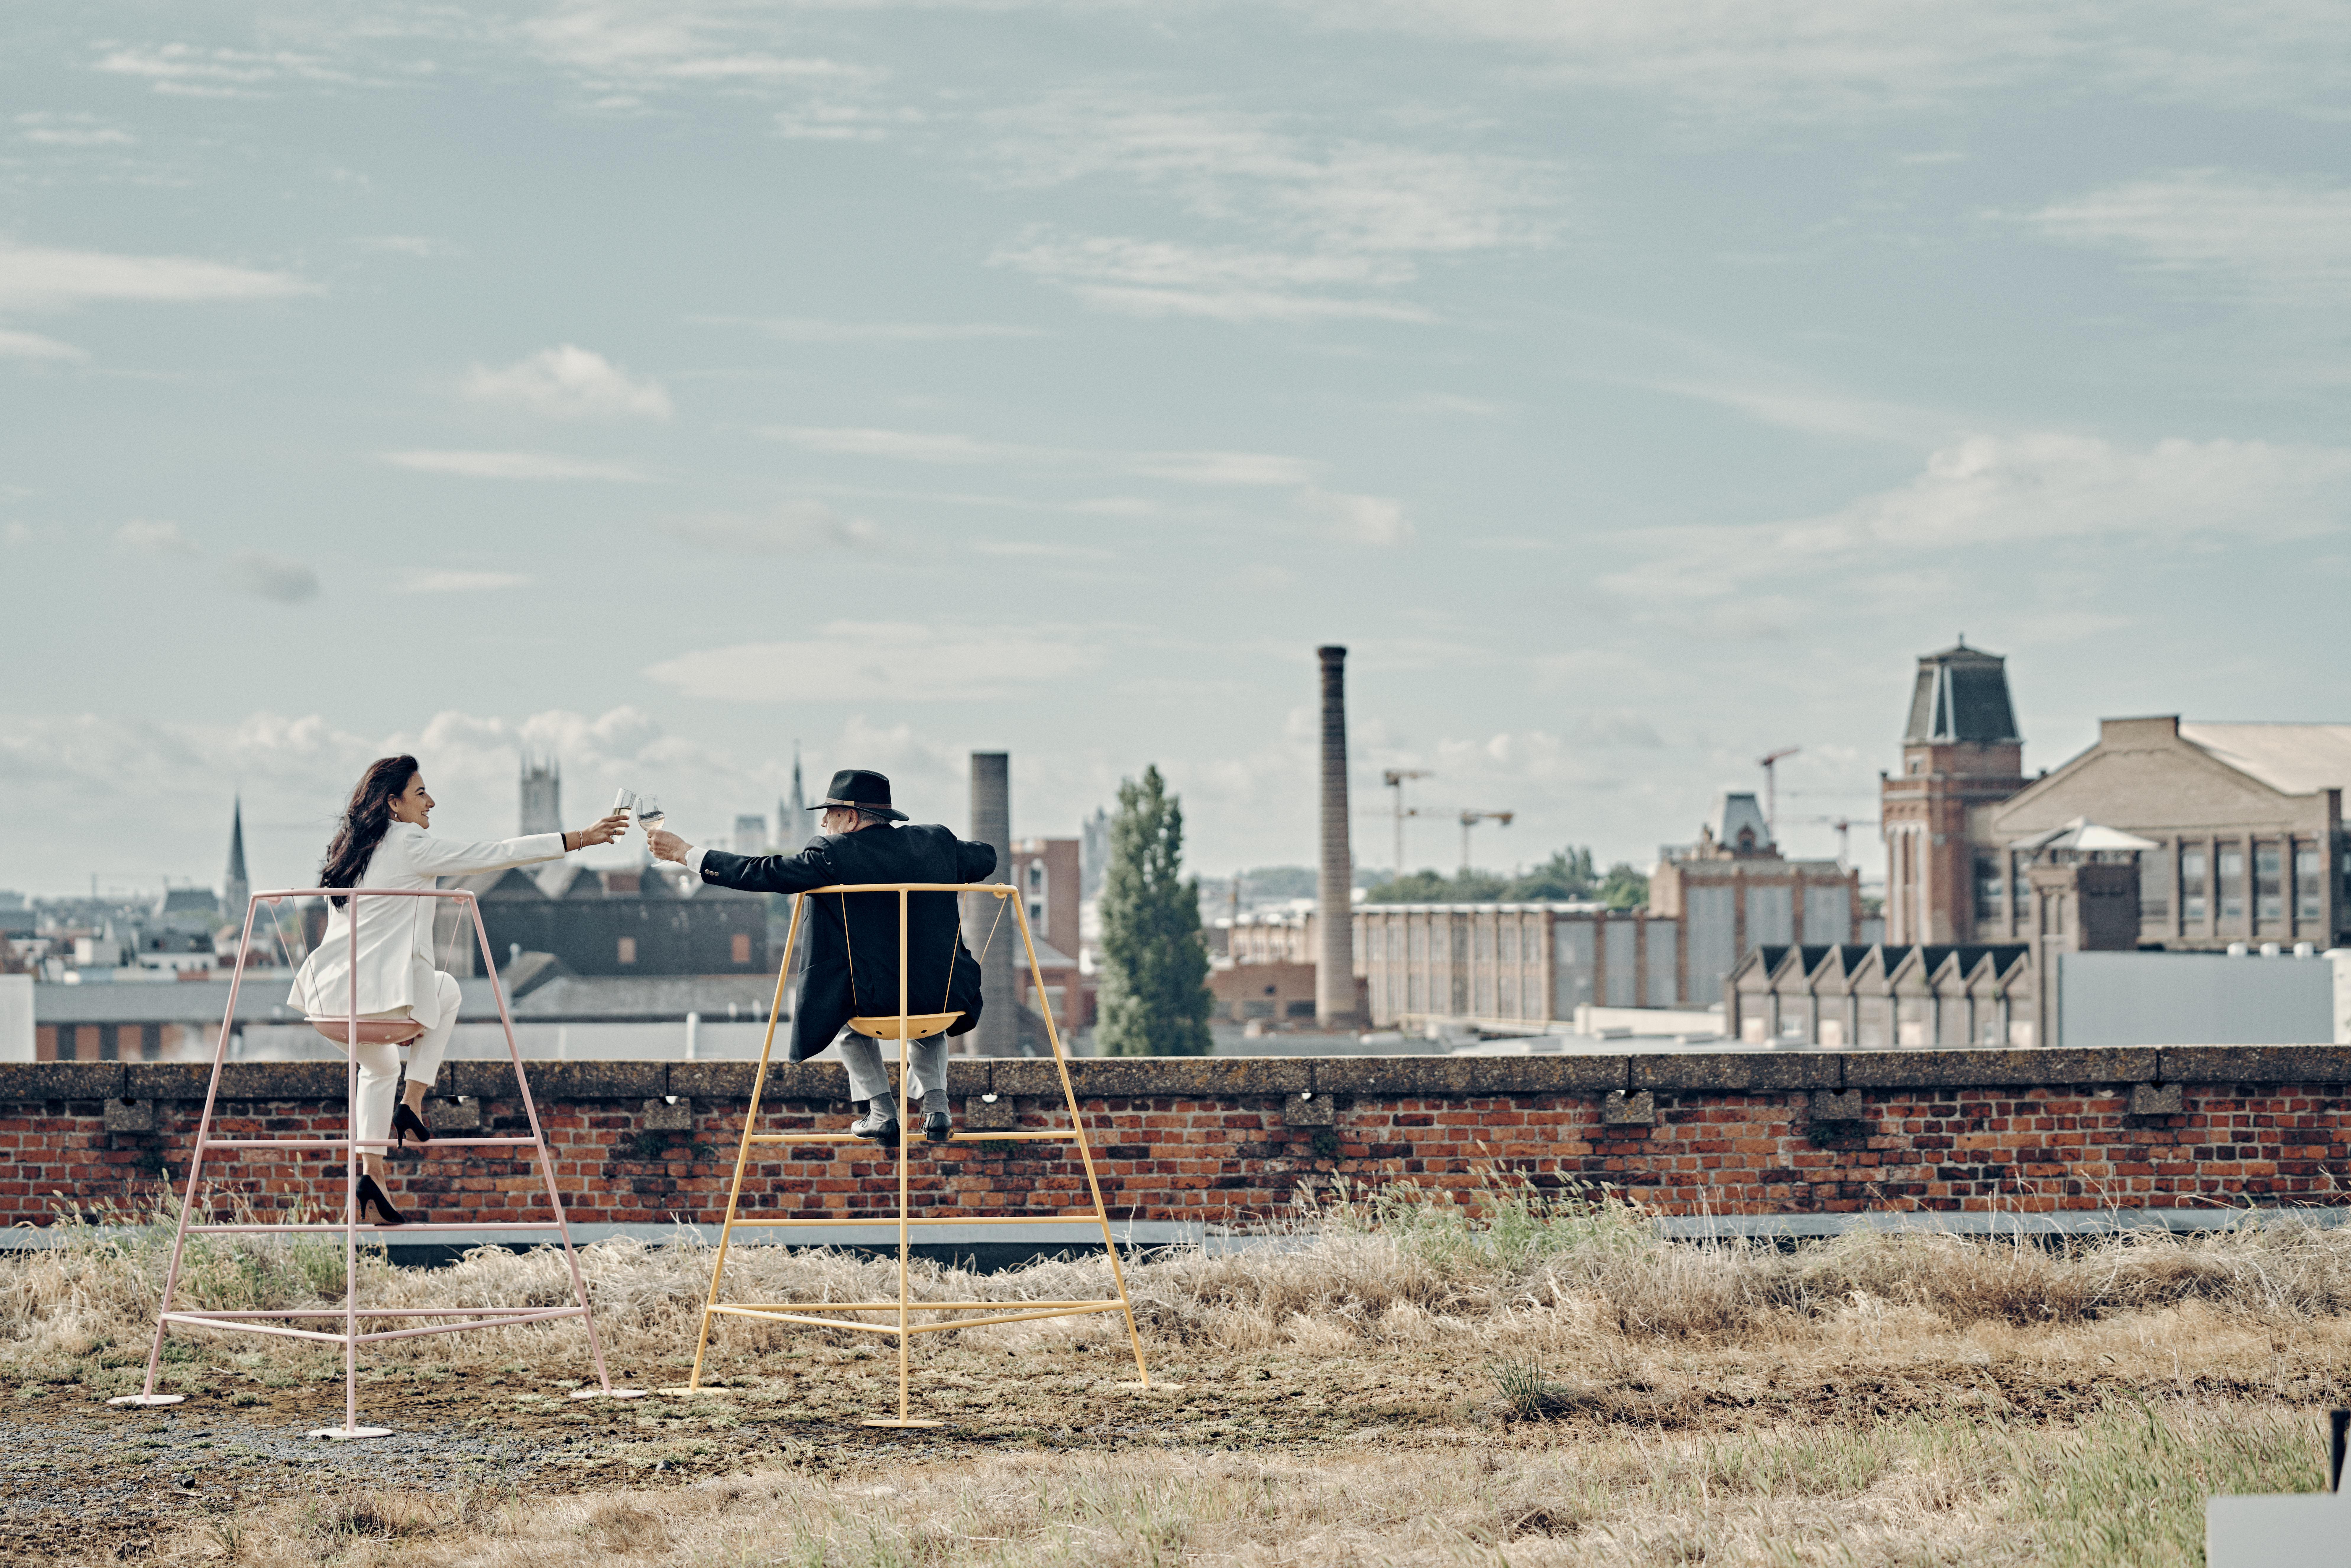 24-08-2020 wijkbudget stad gent strand stoel campagne_0211.jpg